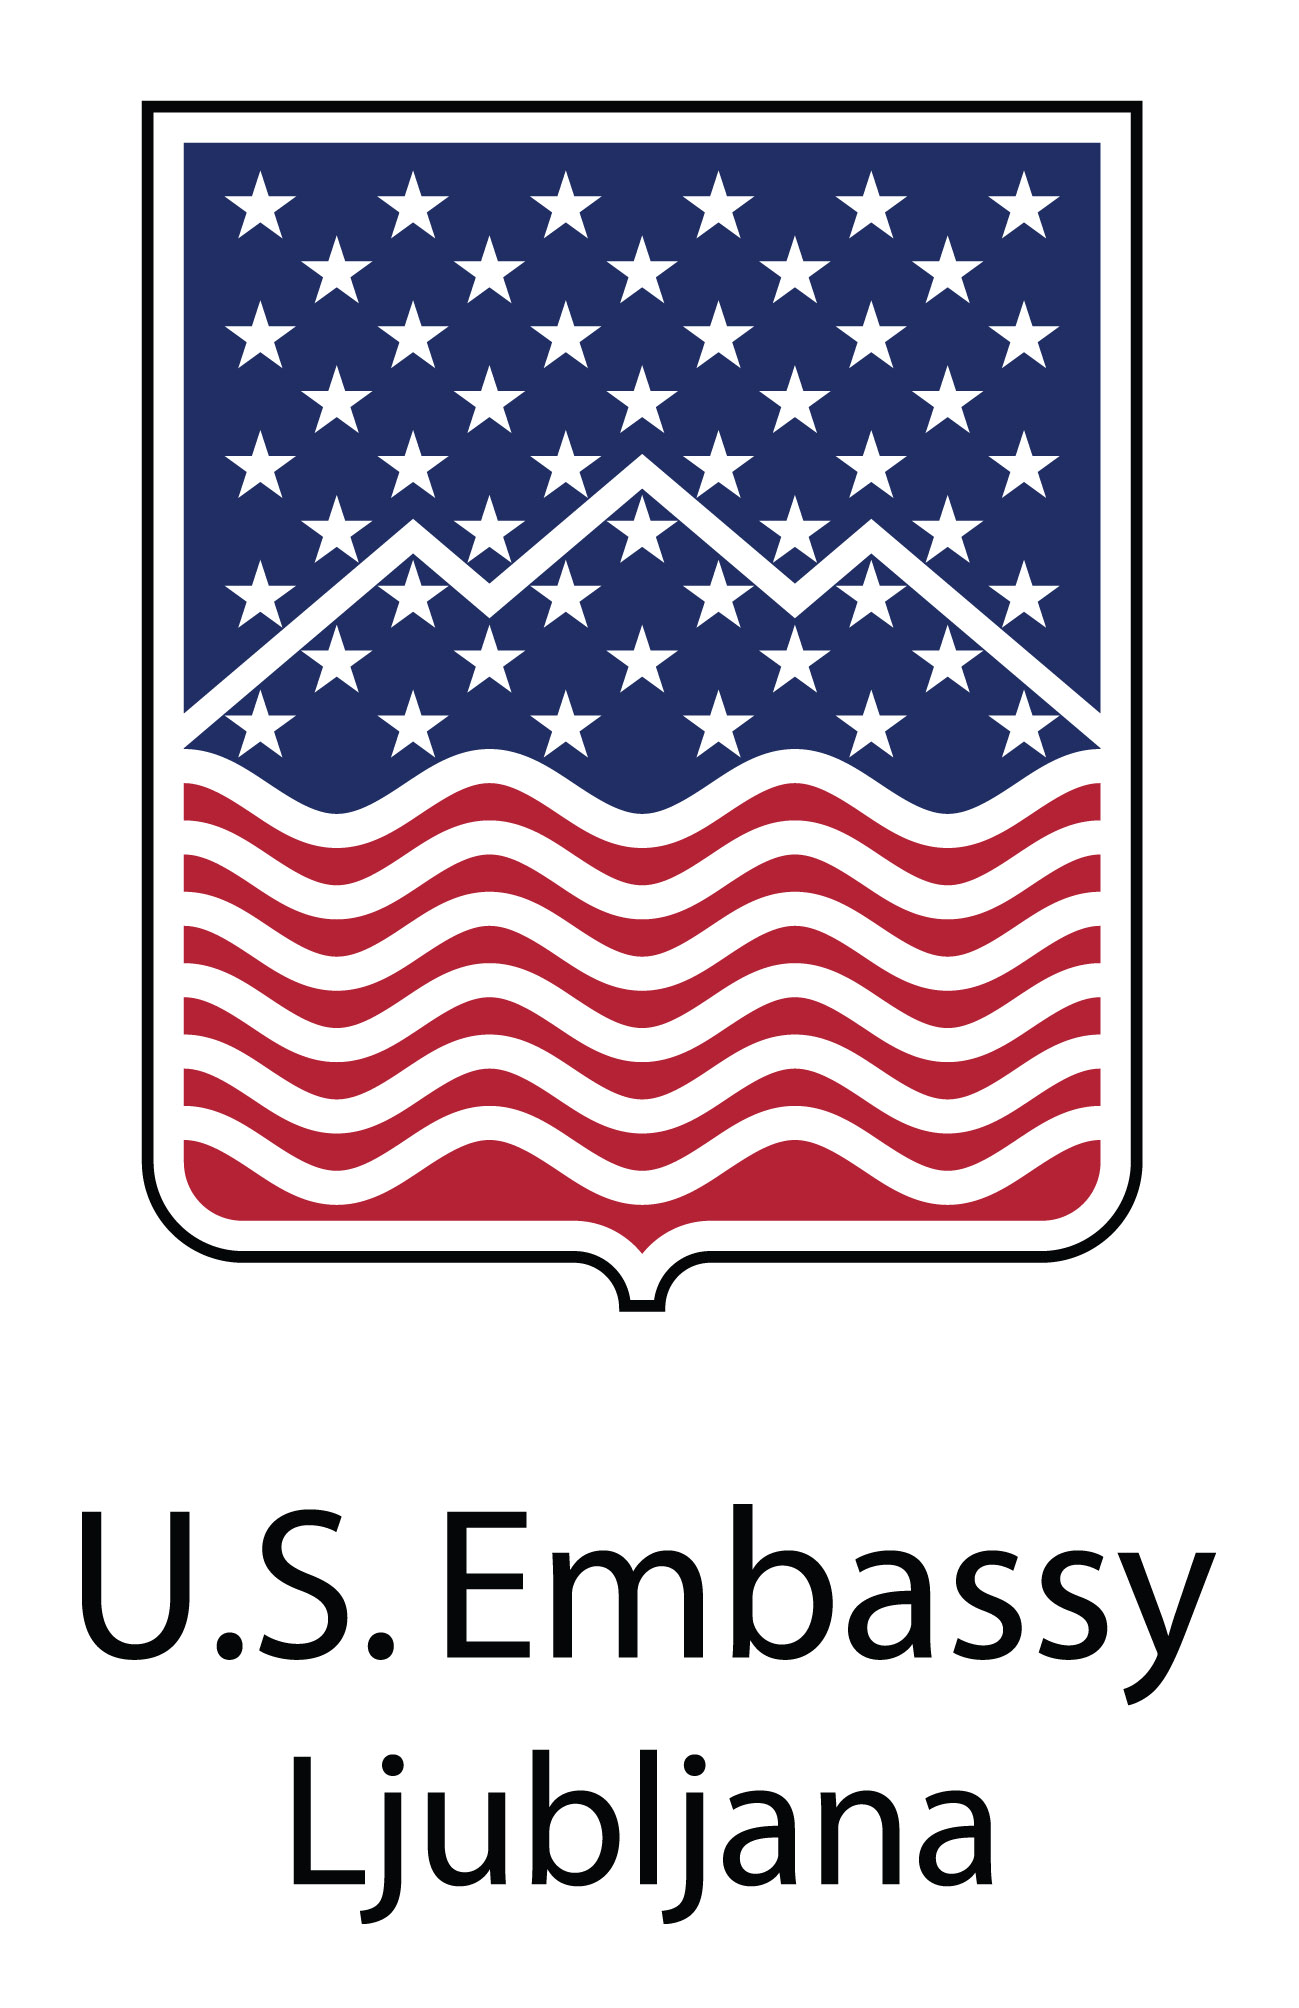 images_Kosarkarski-kamp-2016_US-embassy-ALT-1